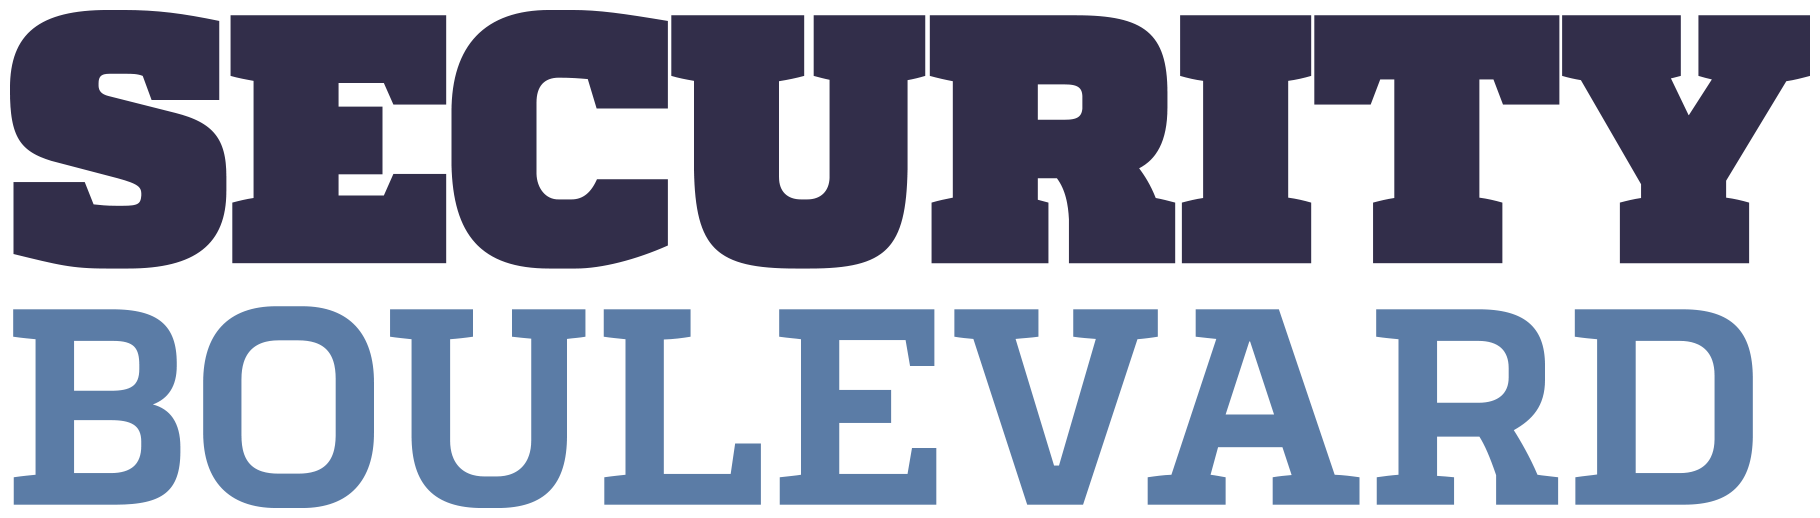 Logo securityboulevard